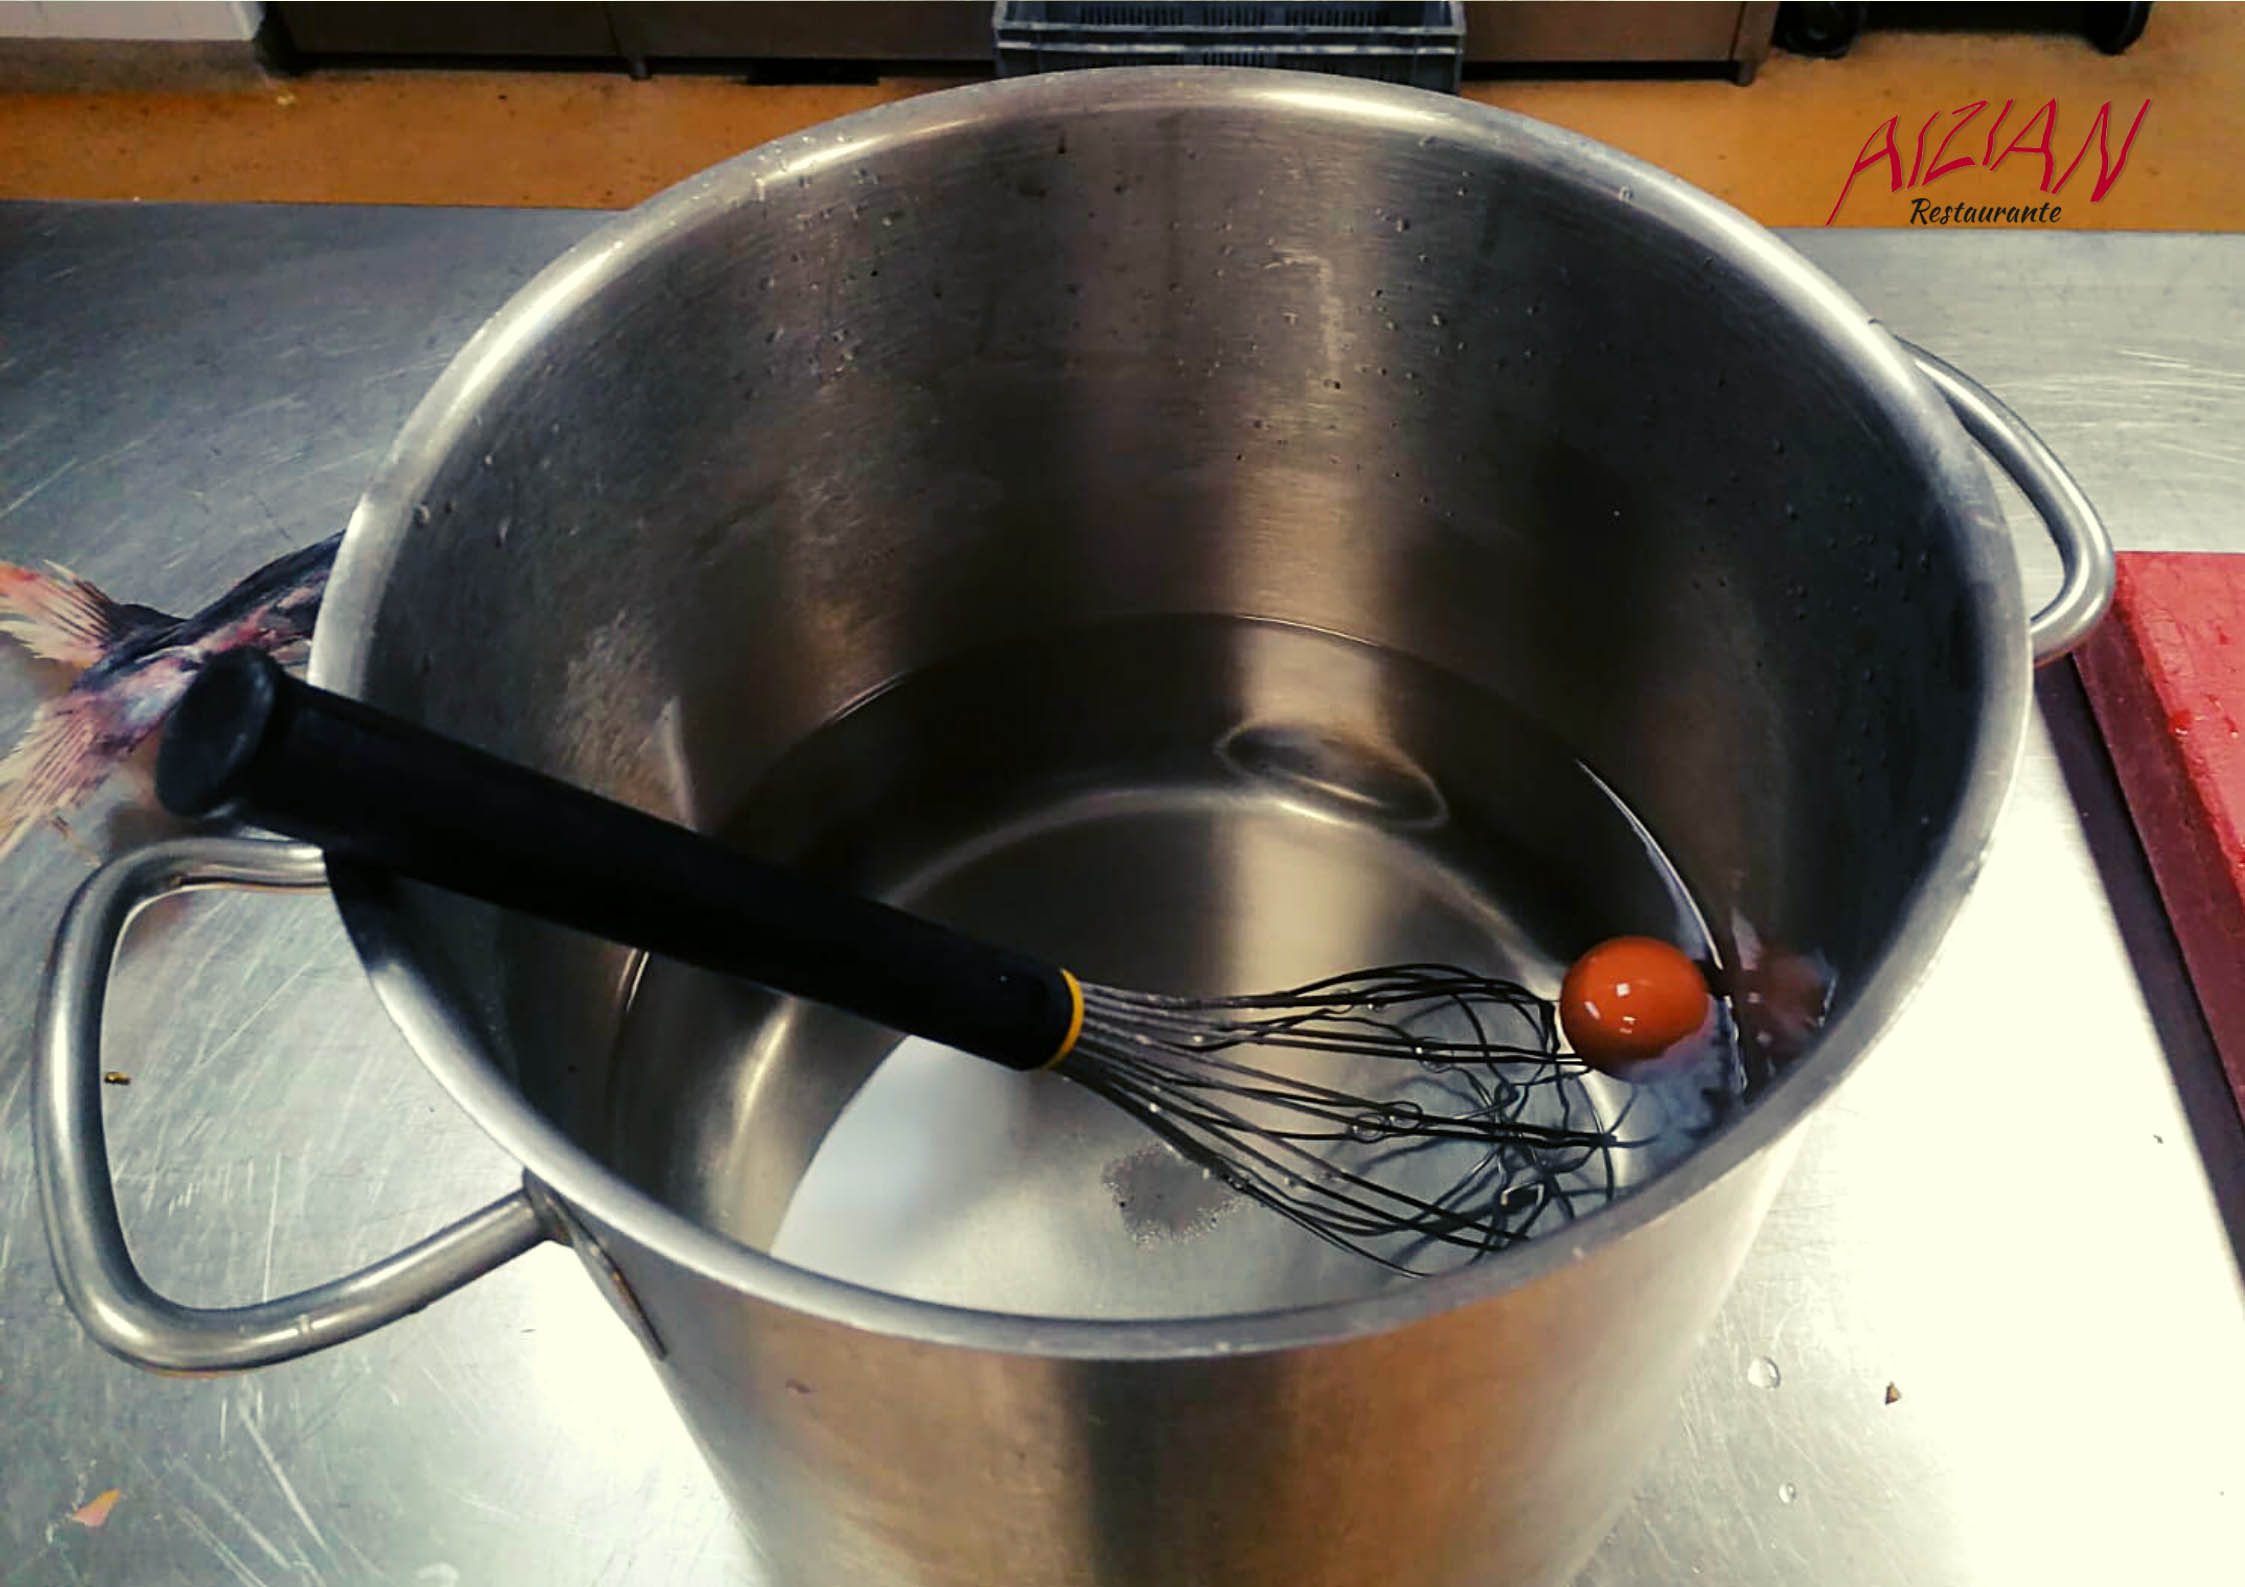 Como hacer conservas de bonito Aizian